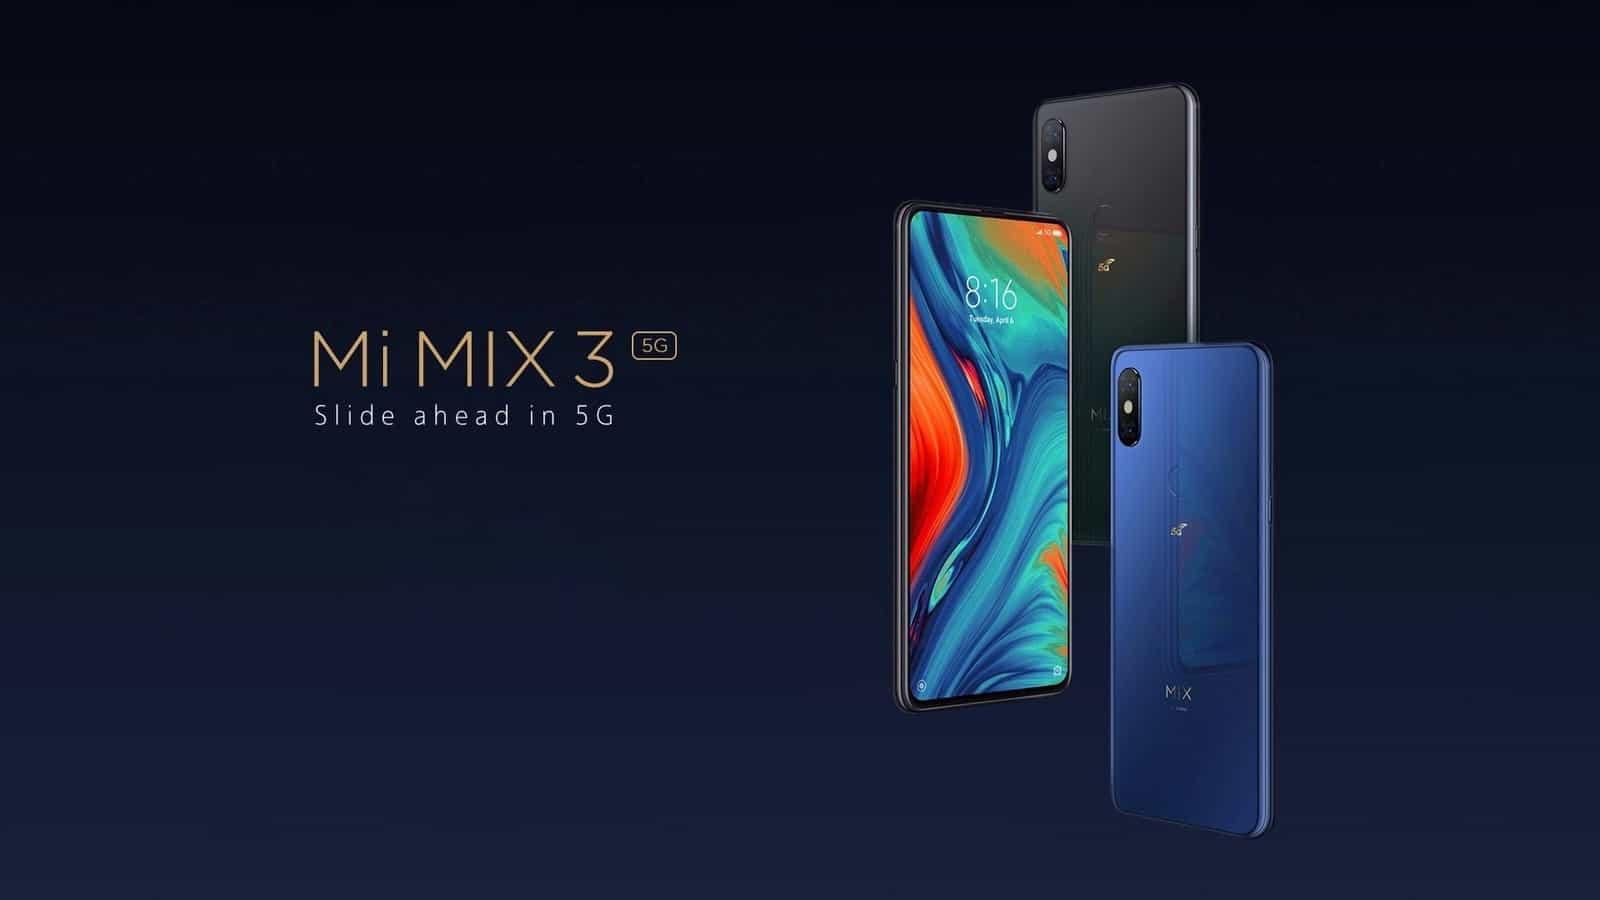 Xiaomi Mi MIX 3 5G offical image 1